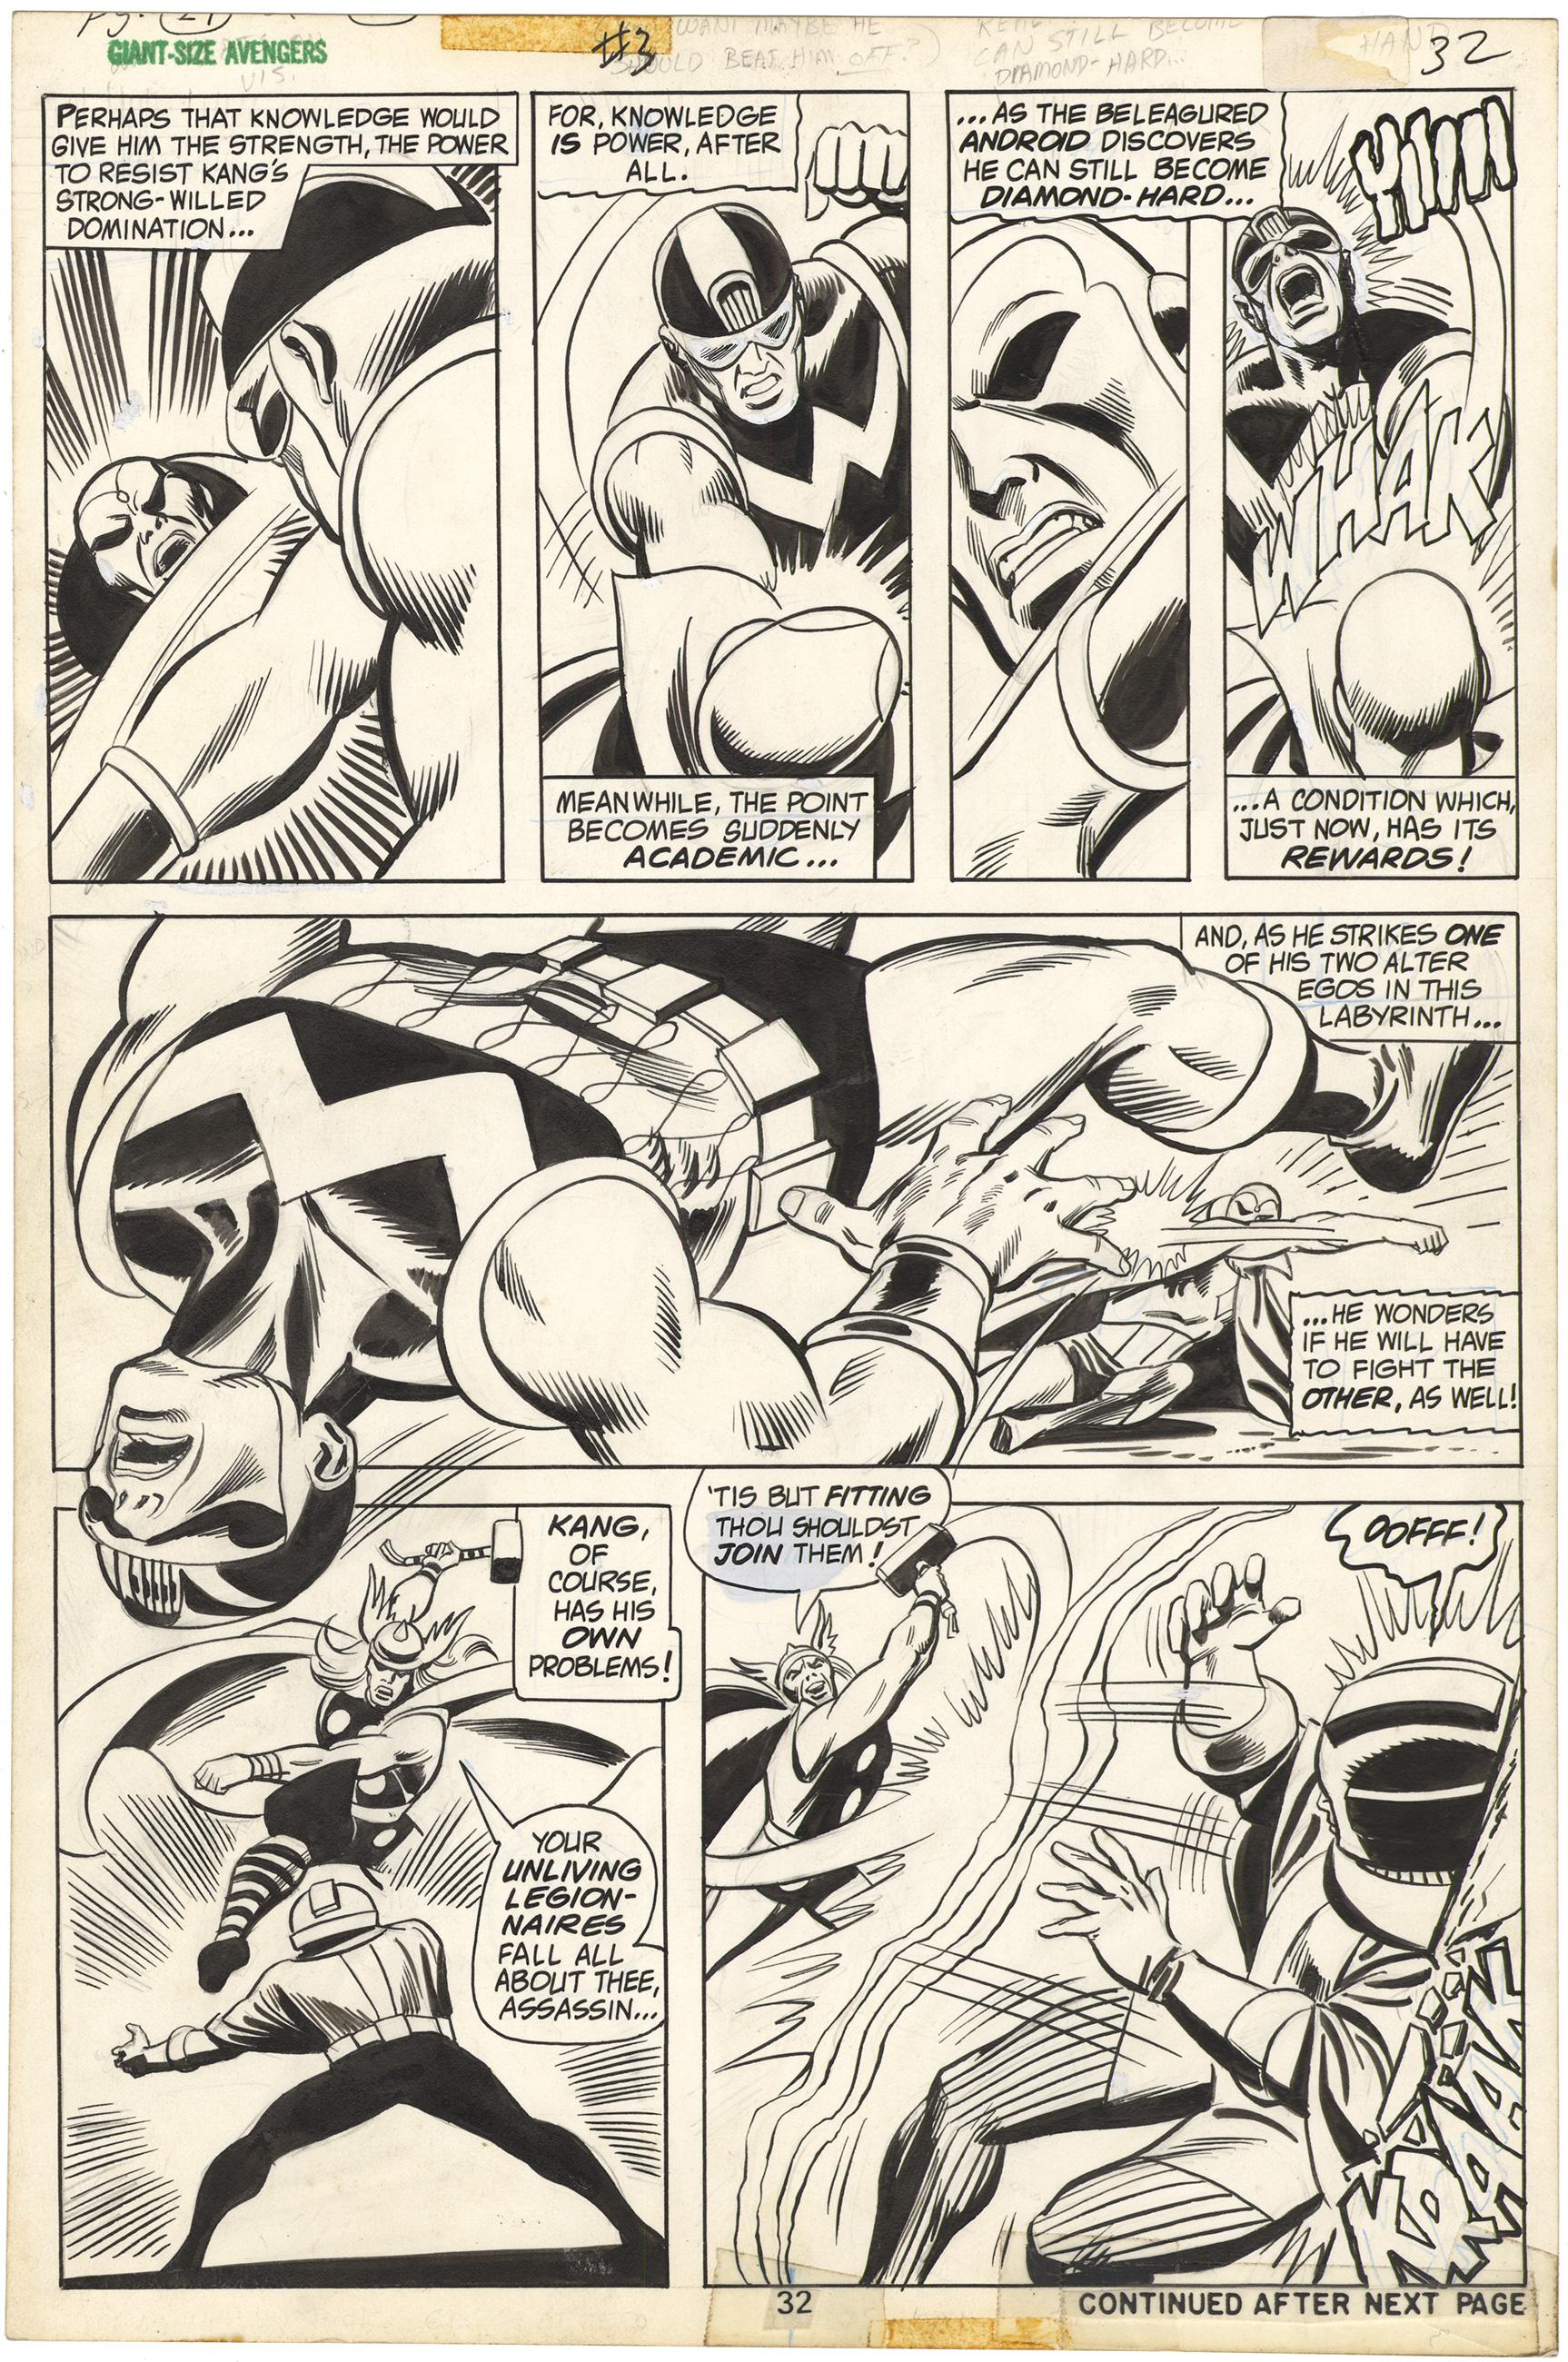 Giant-Size Avengers #3 p32